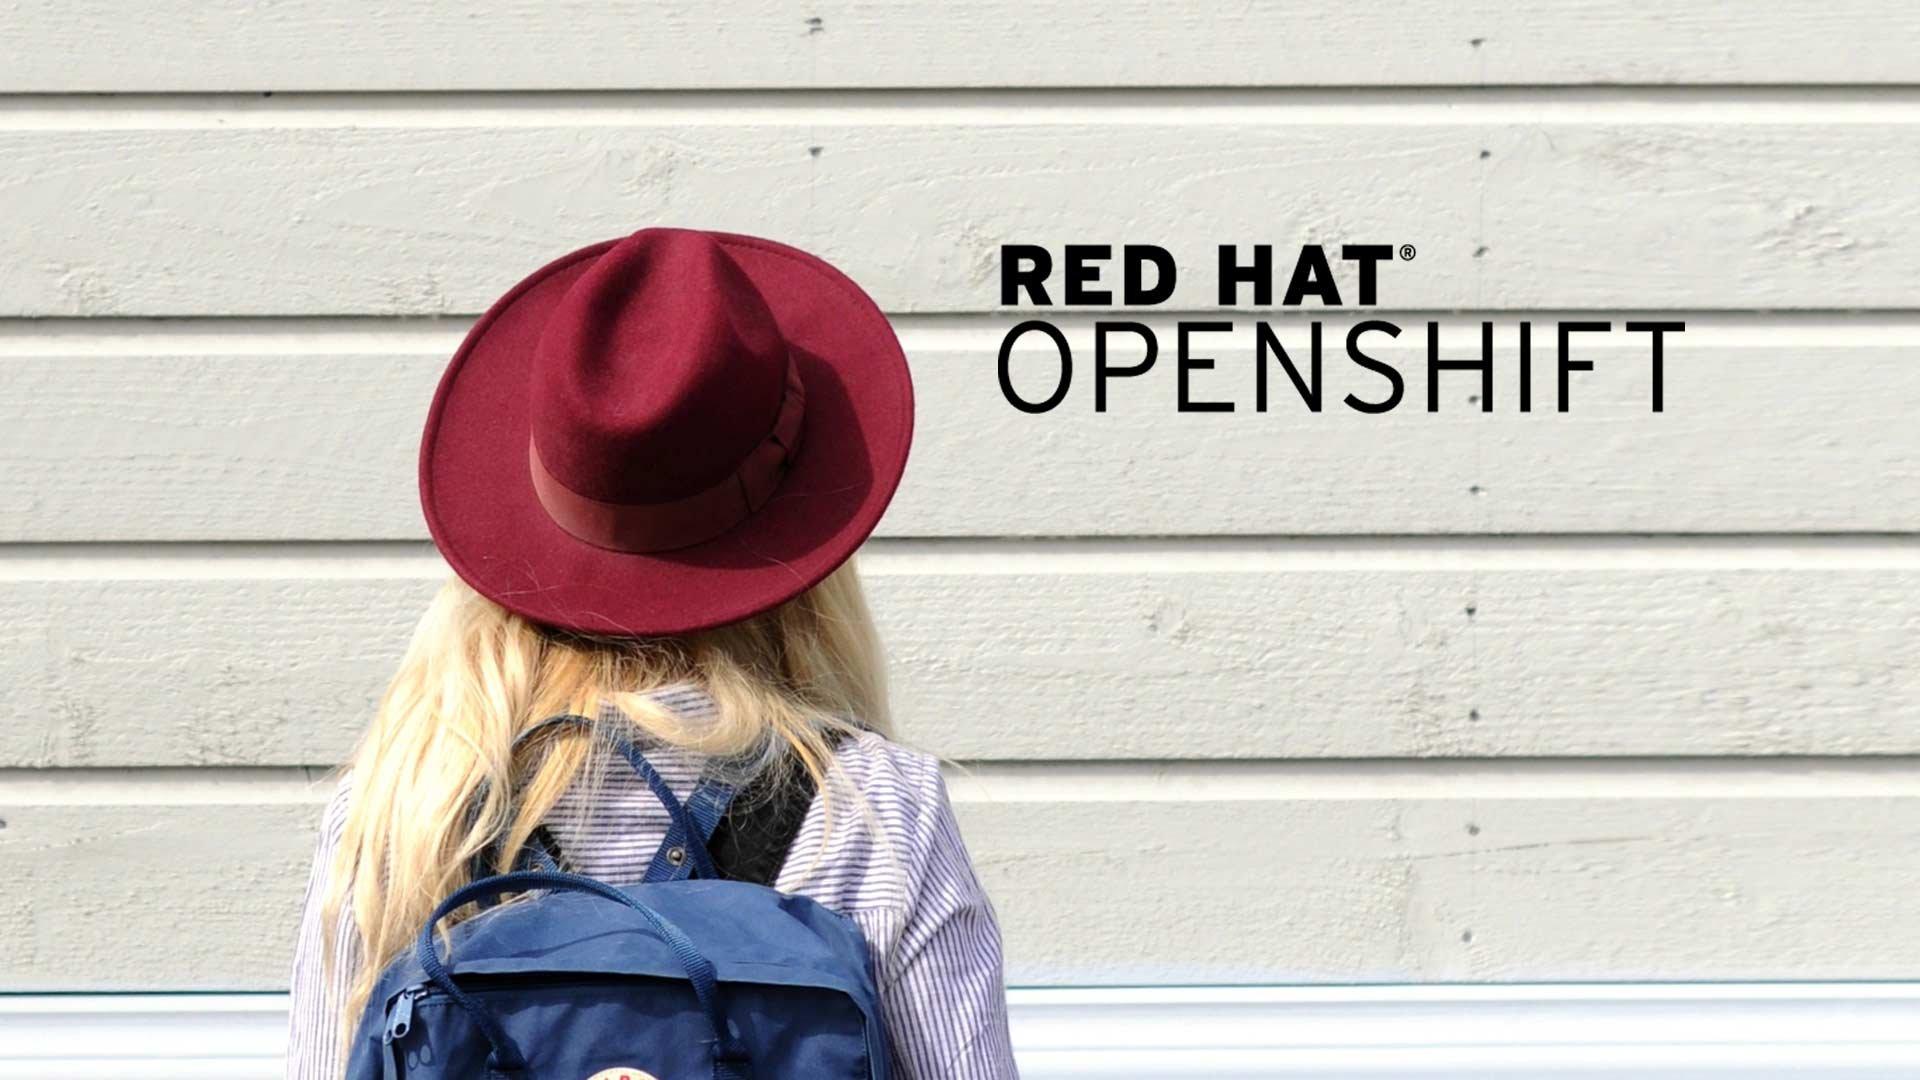 I migliori strumenti DevOps tools | Red Hat OpenShift